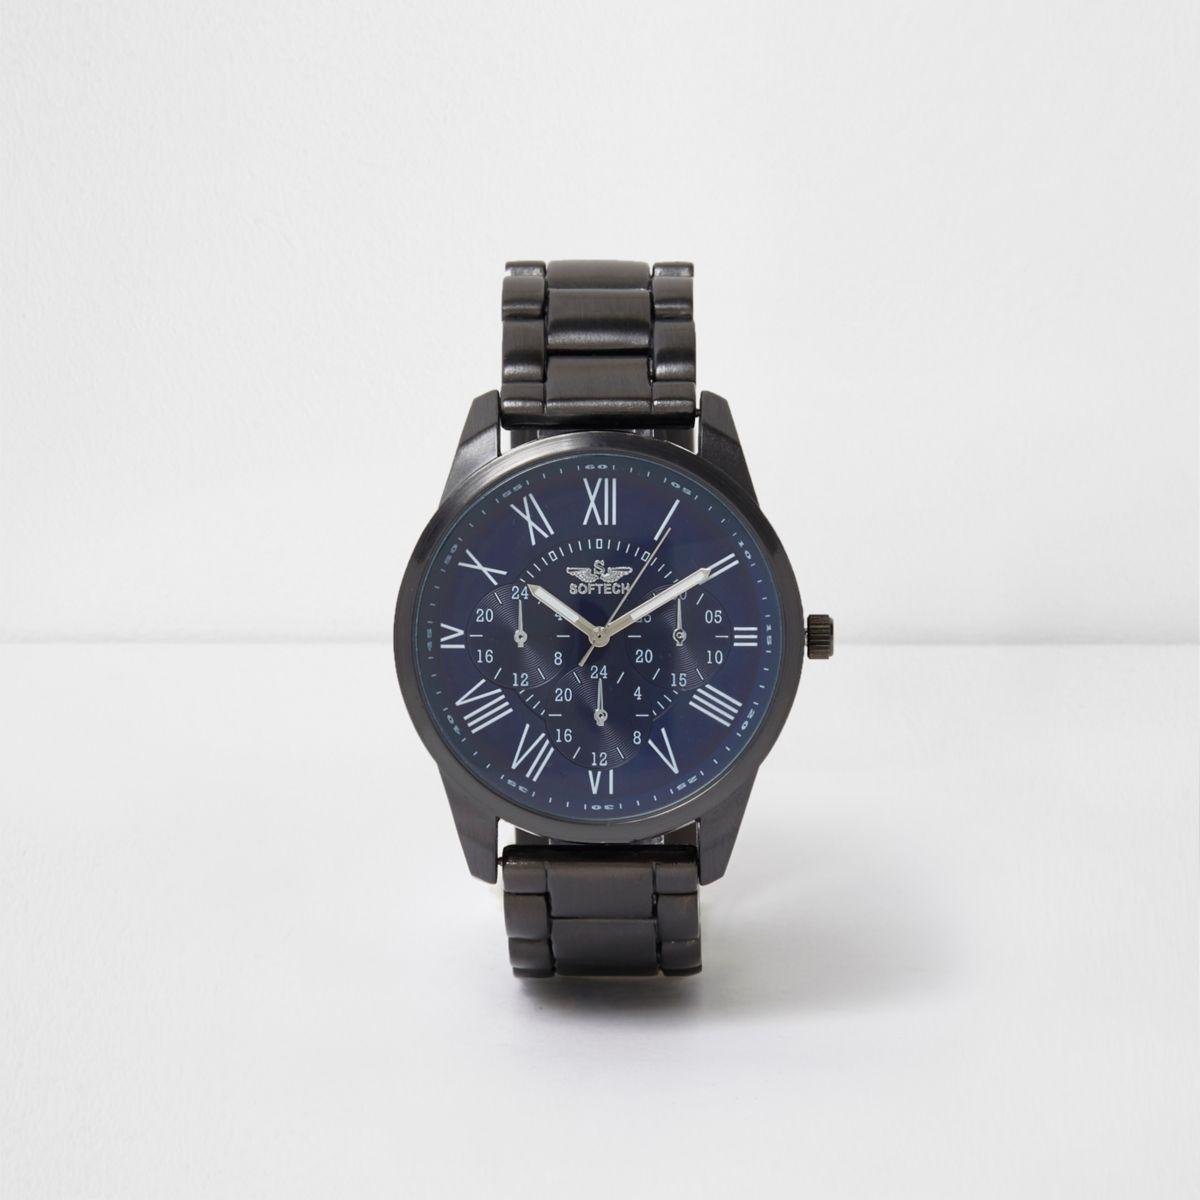 Blue round face metal watch